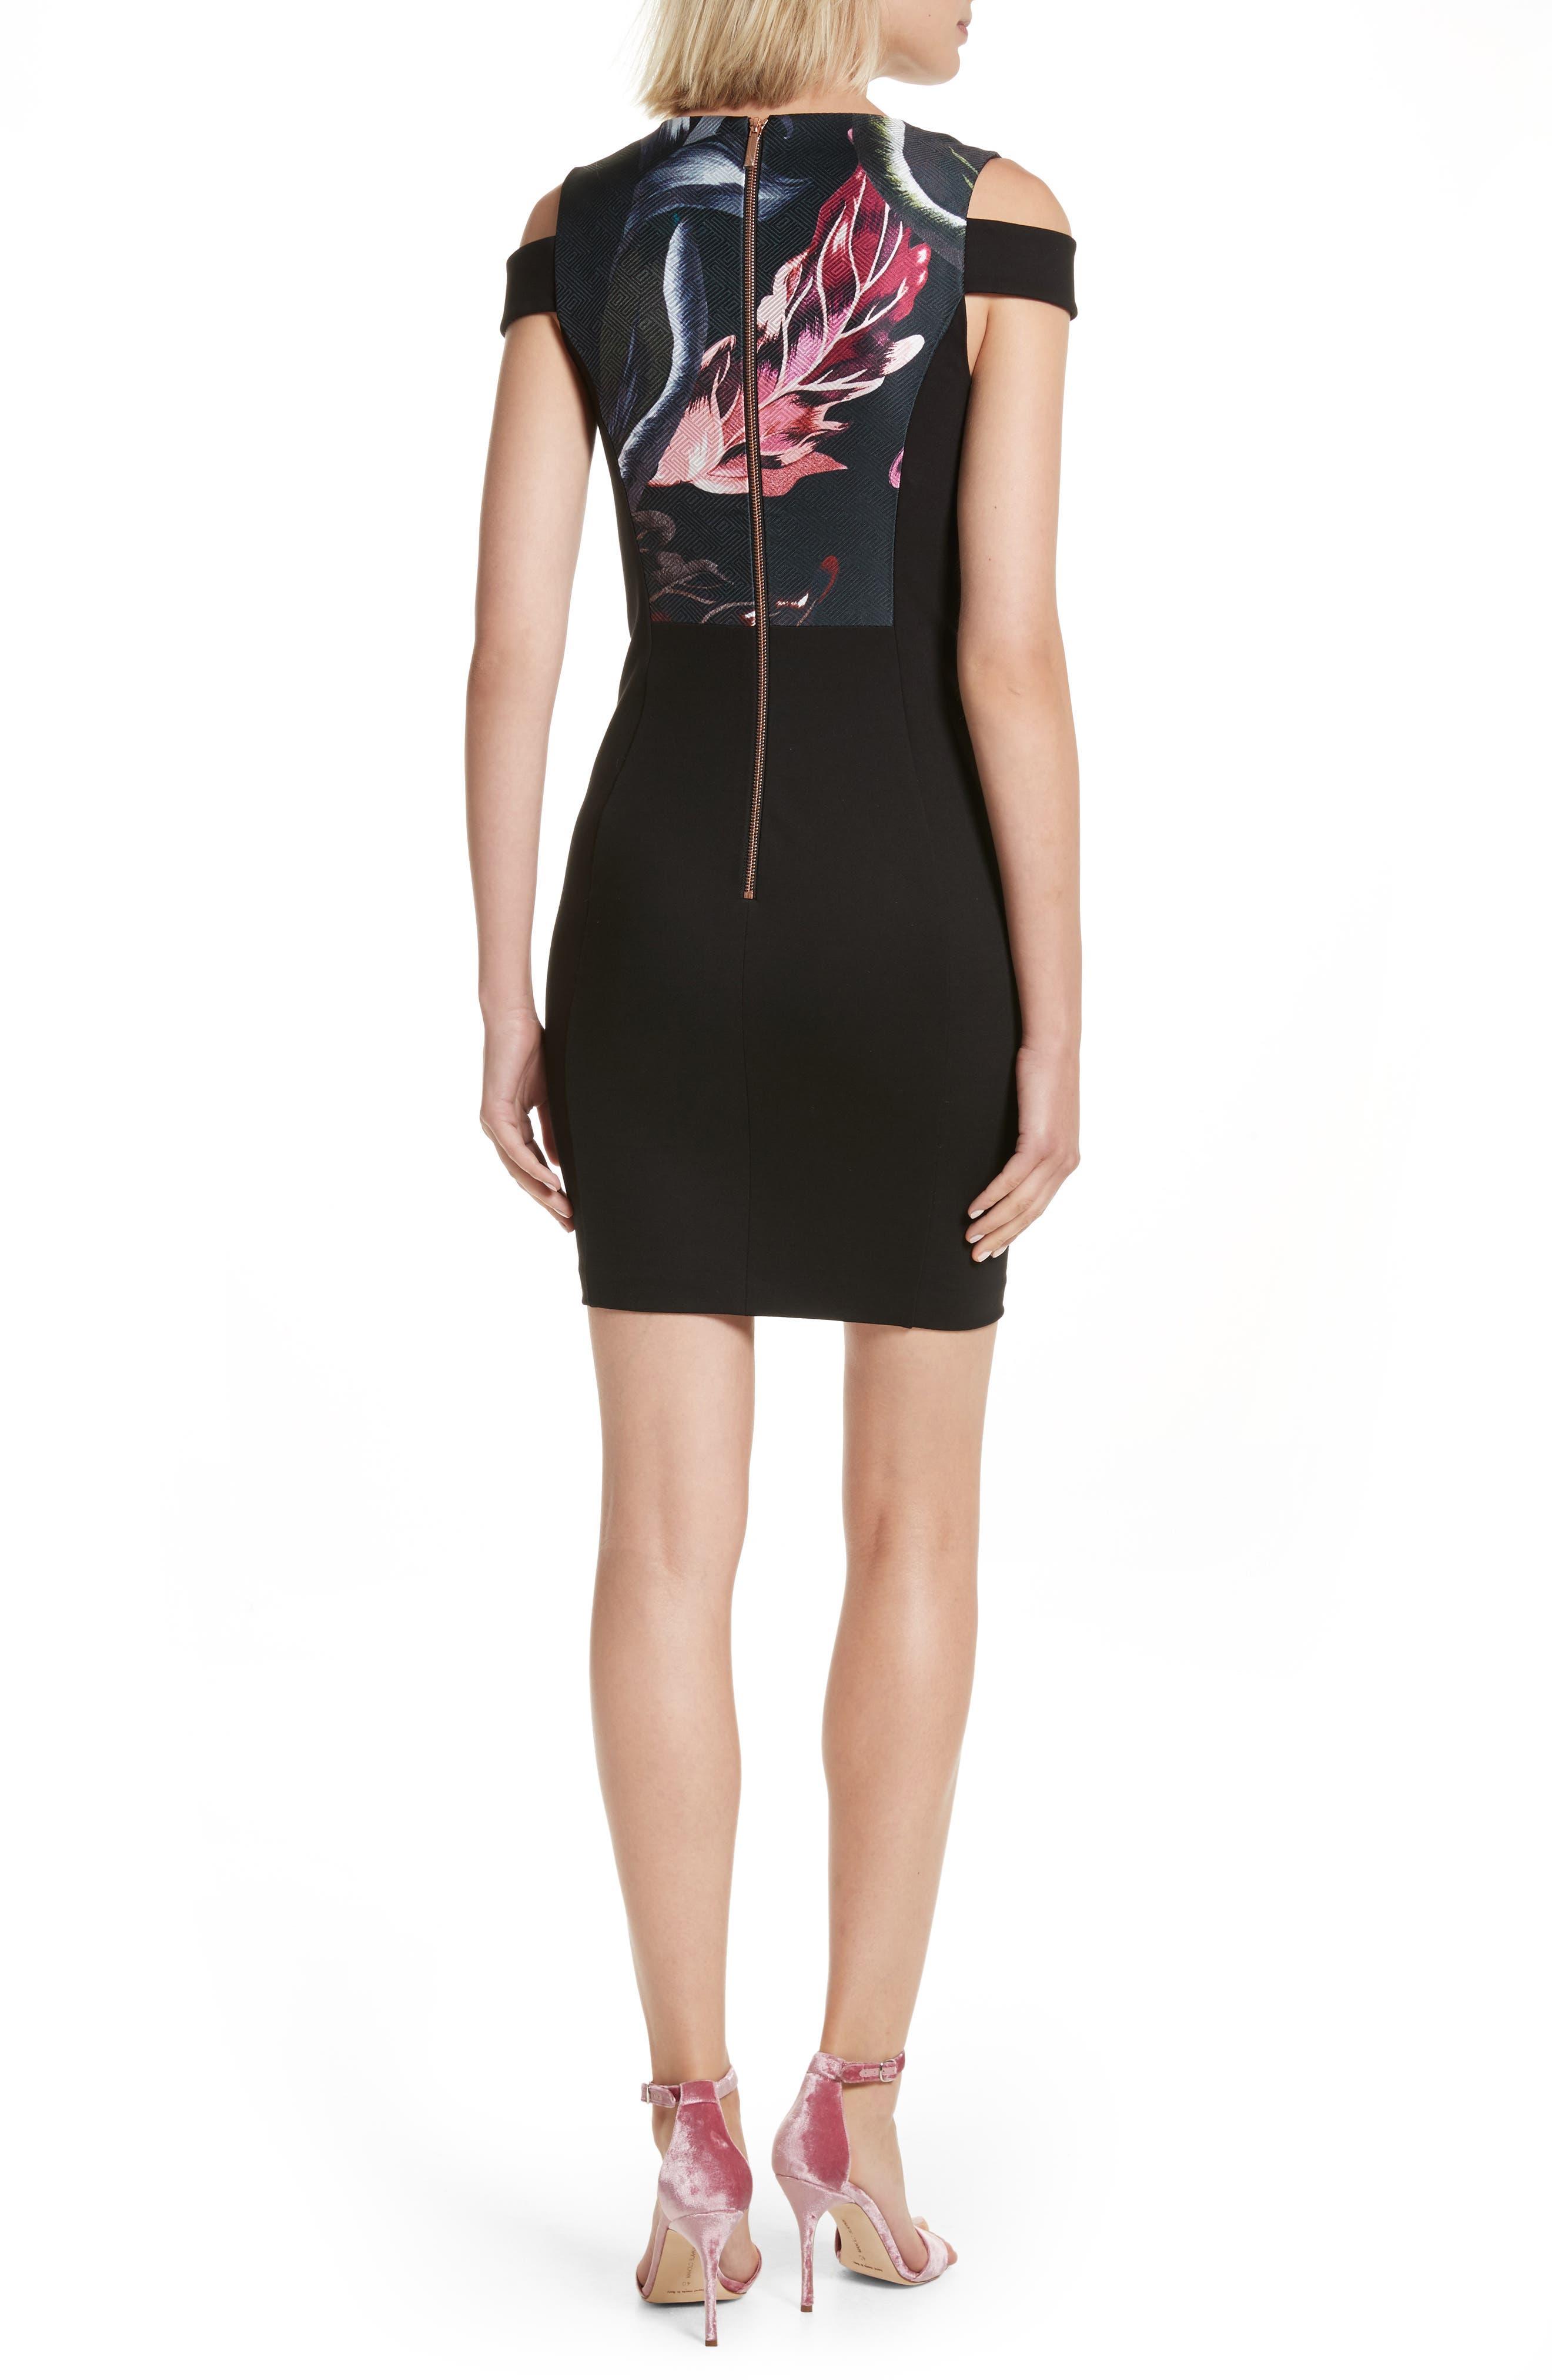 Leeash Eden Body Con Dress,                             Alternate thumbnail 2, color,                             Black